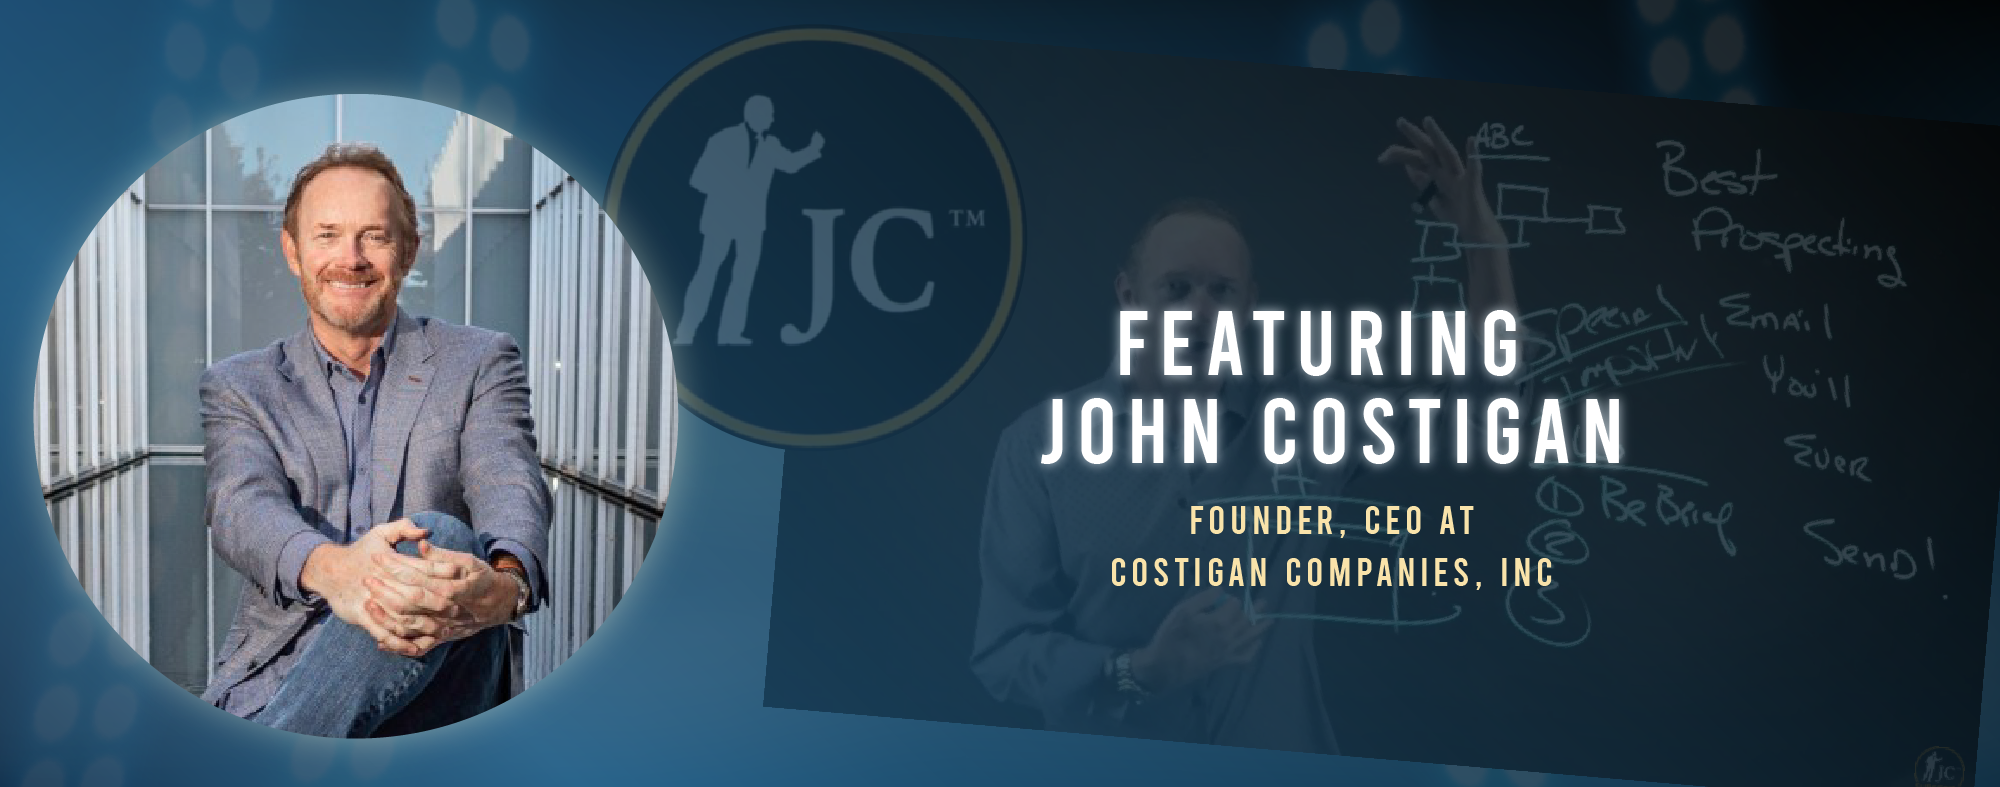 John Costigan